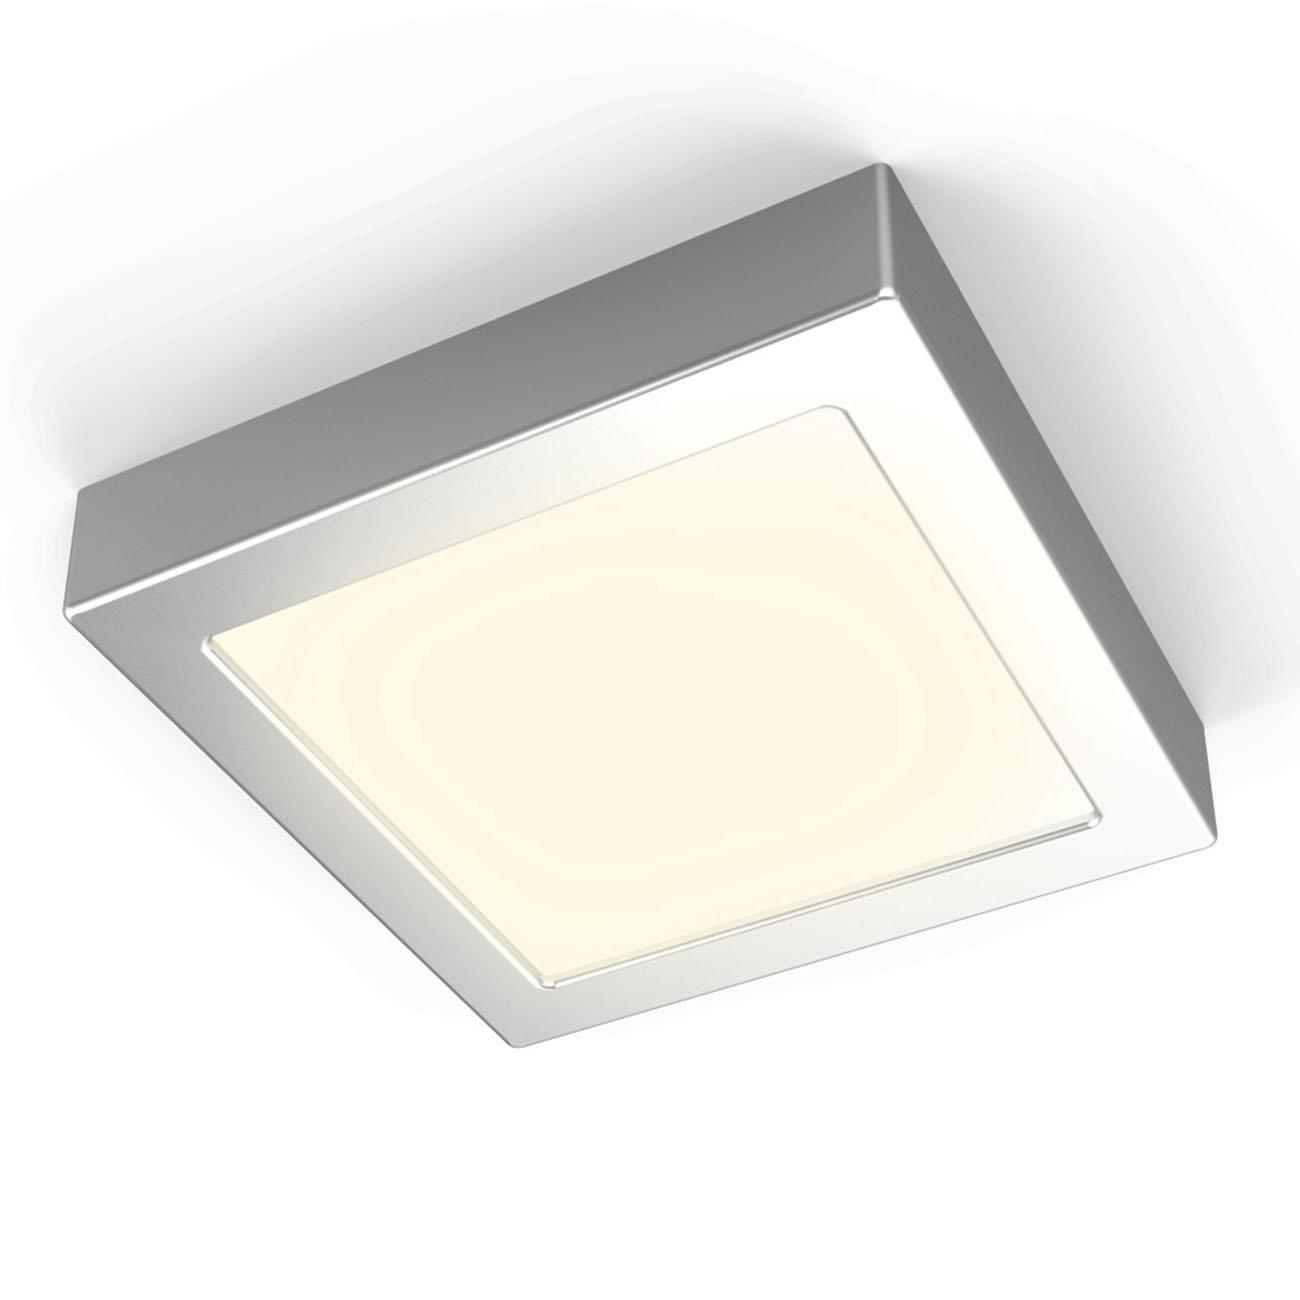 LED Aufbauleuchte Aufputzstrahler eckig grau